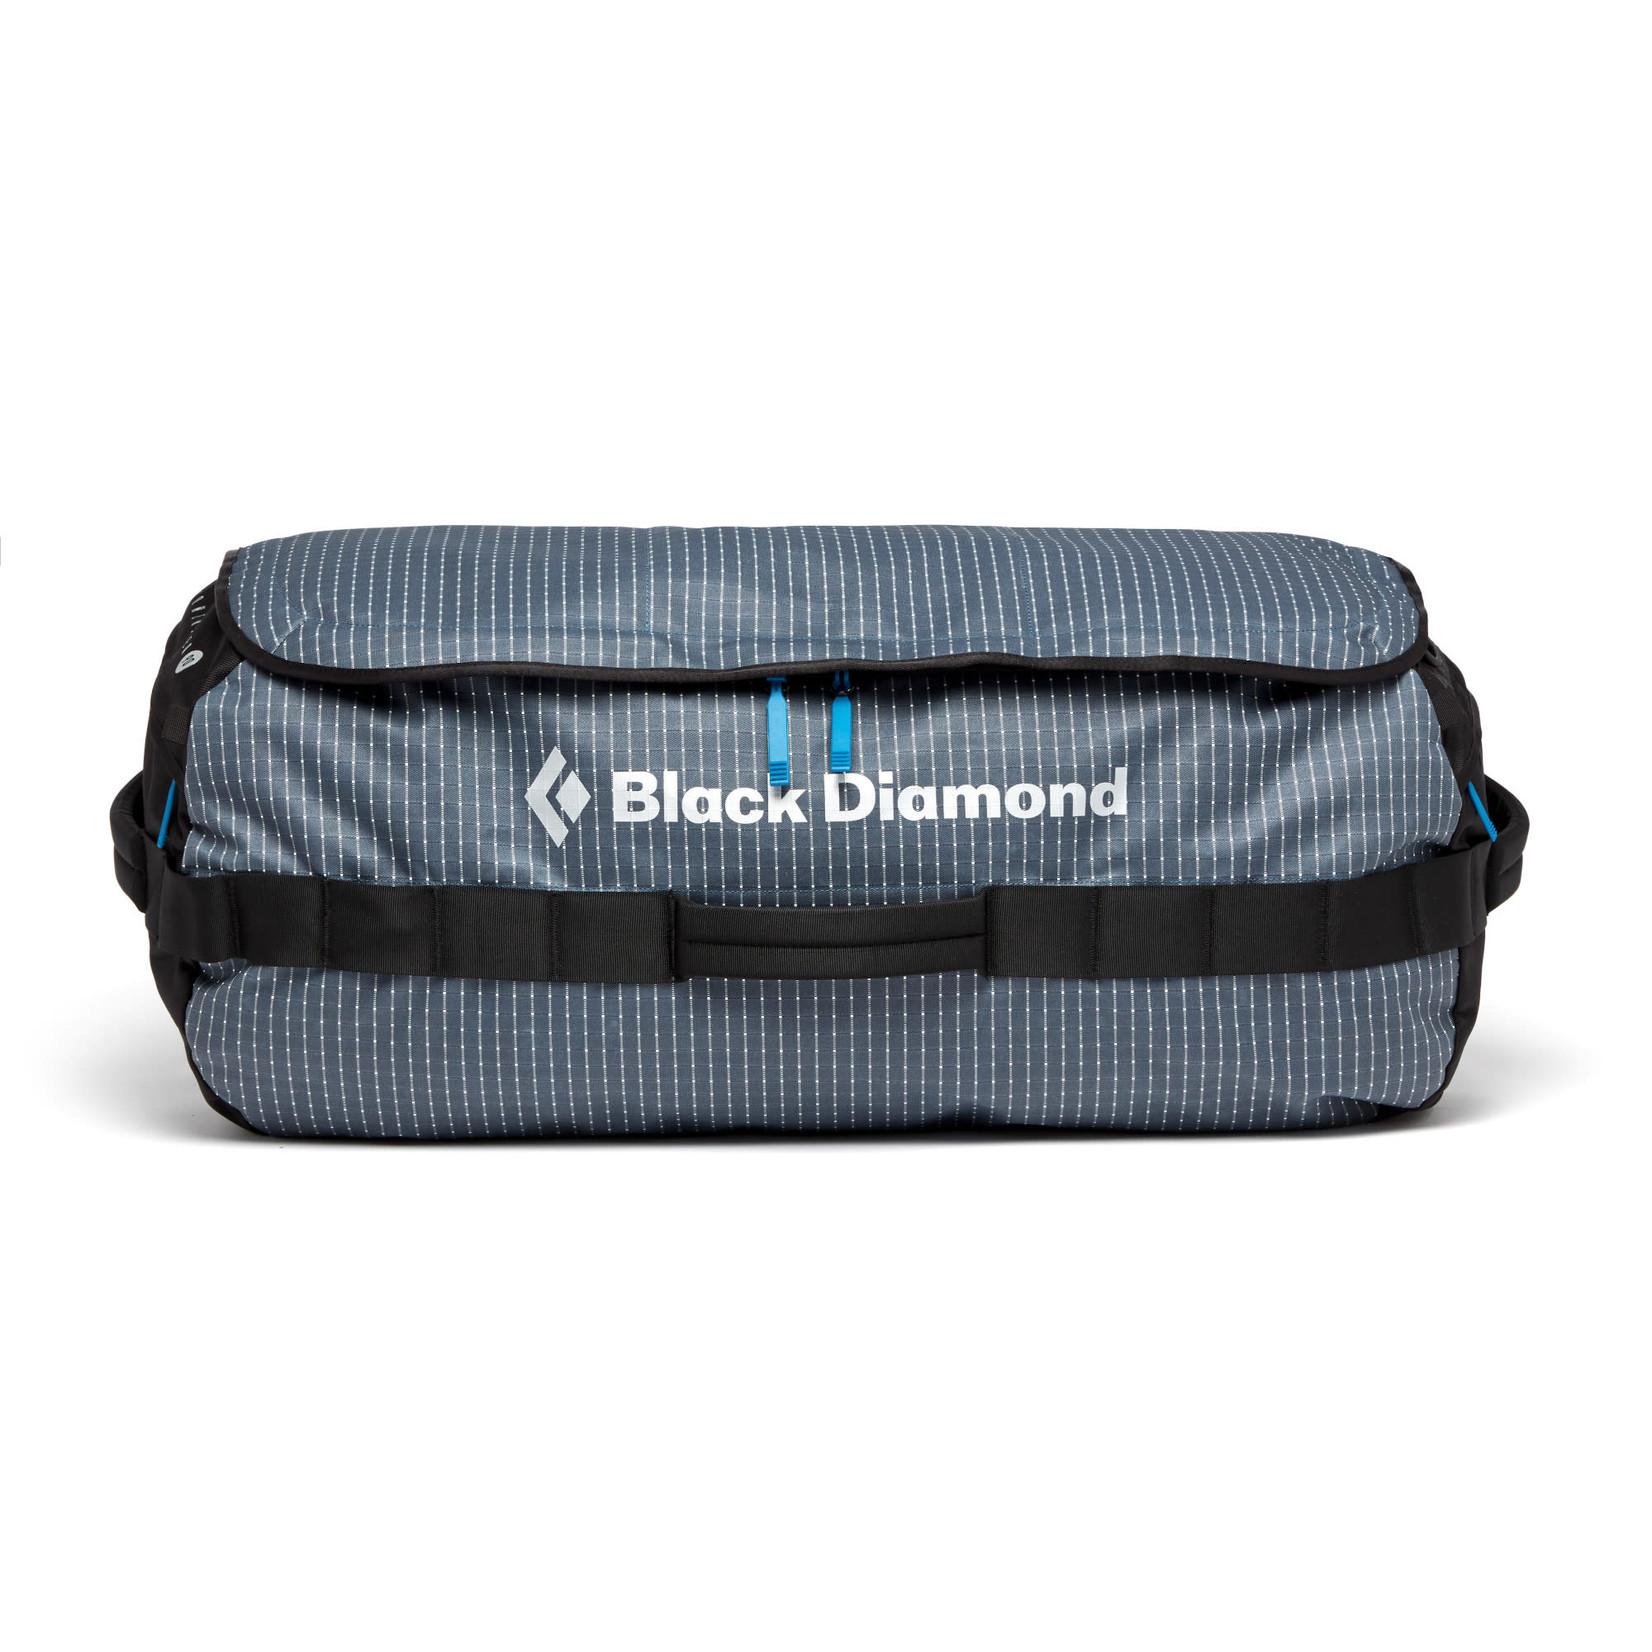 Black Diamond Sac fourre-tout Black Diamond Stonehauler 90 L